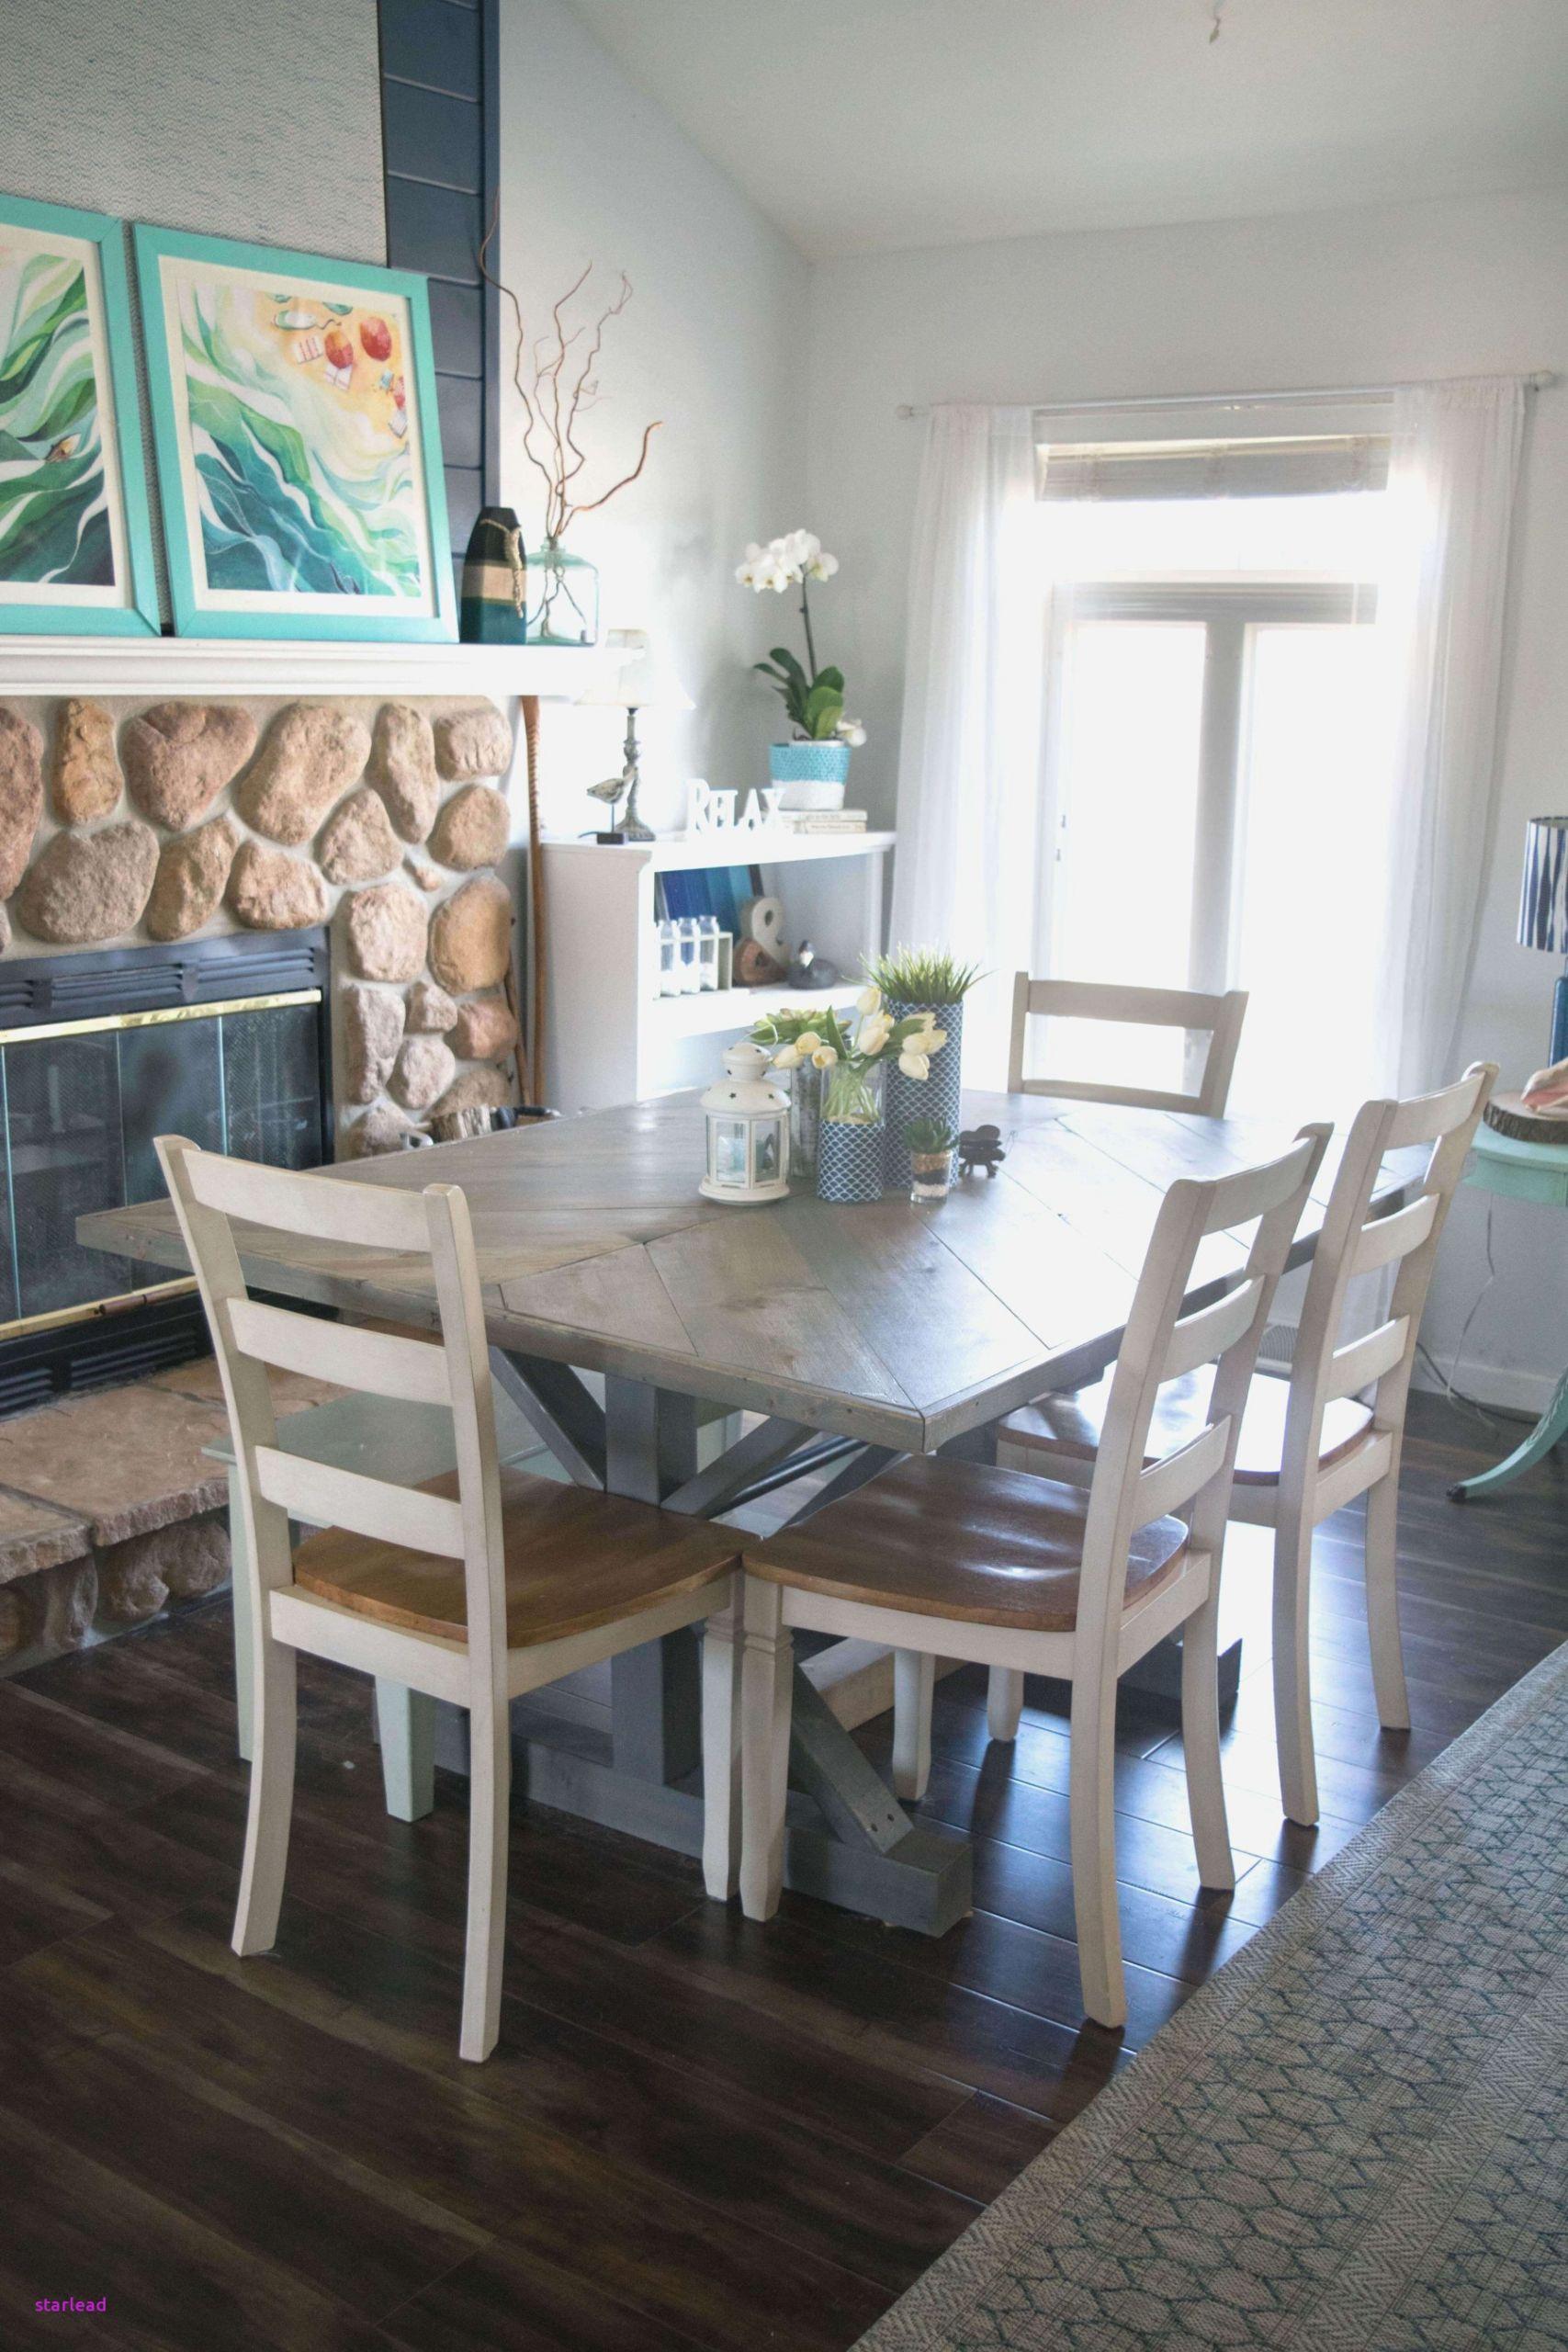 ebay hardwood flooring of white dining room furniture unique shabby chic living room ideas throughout white dining room furniture unique shabby chic living room ideas best decor chic decor c